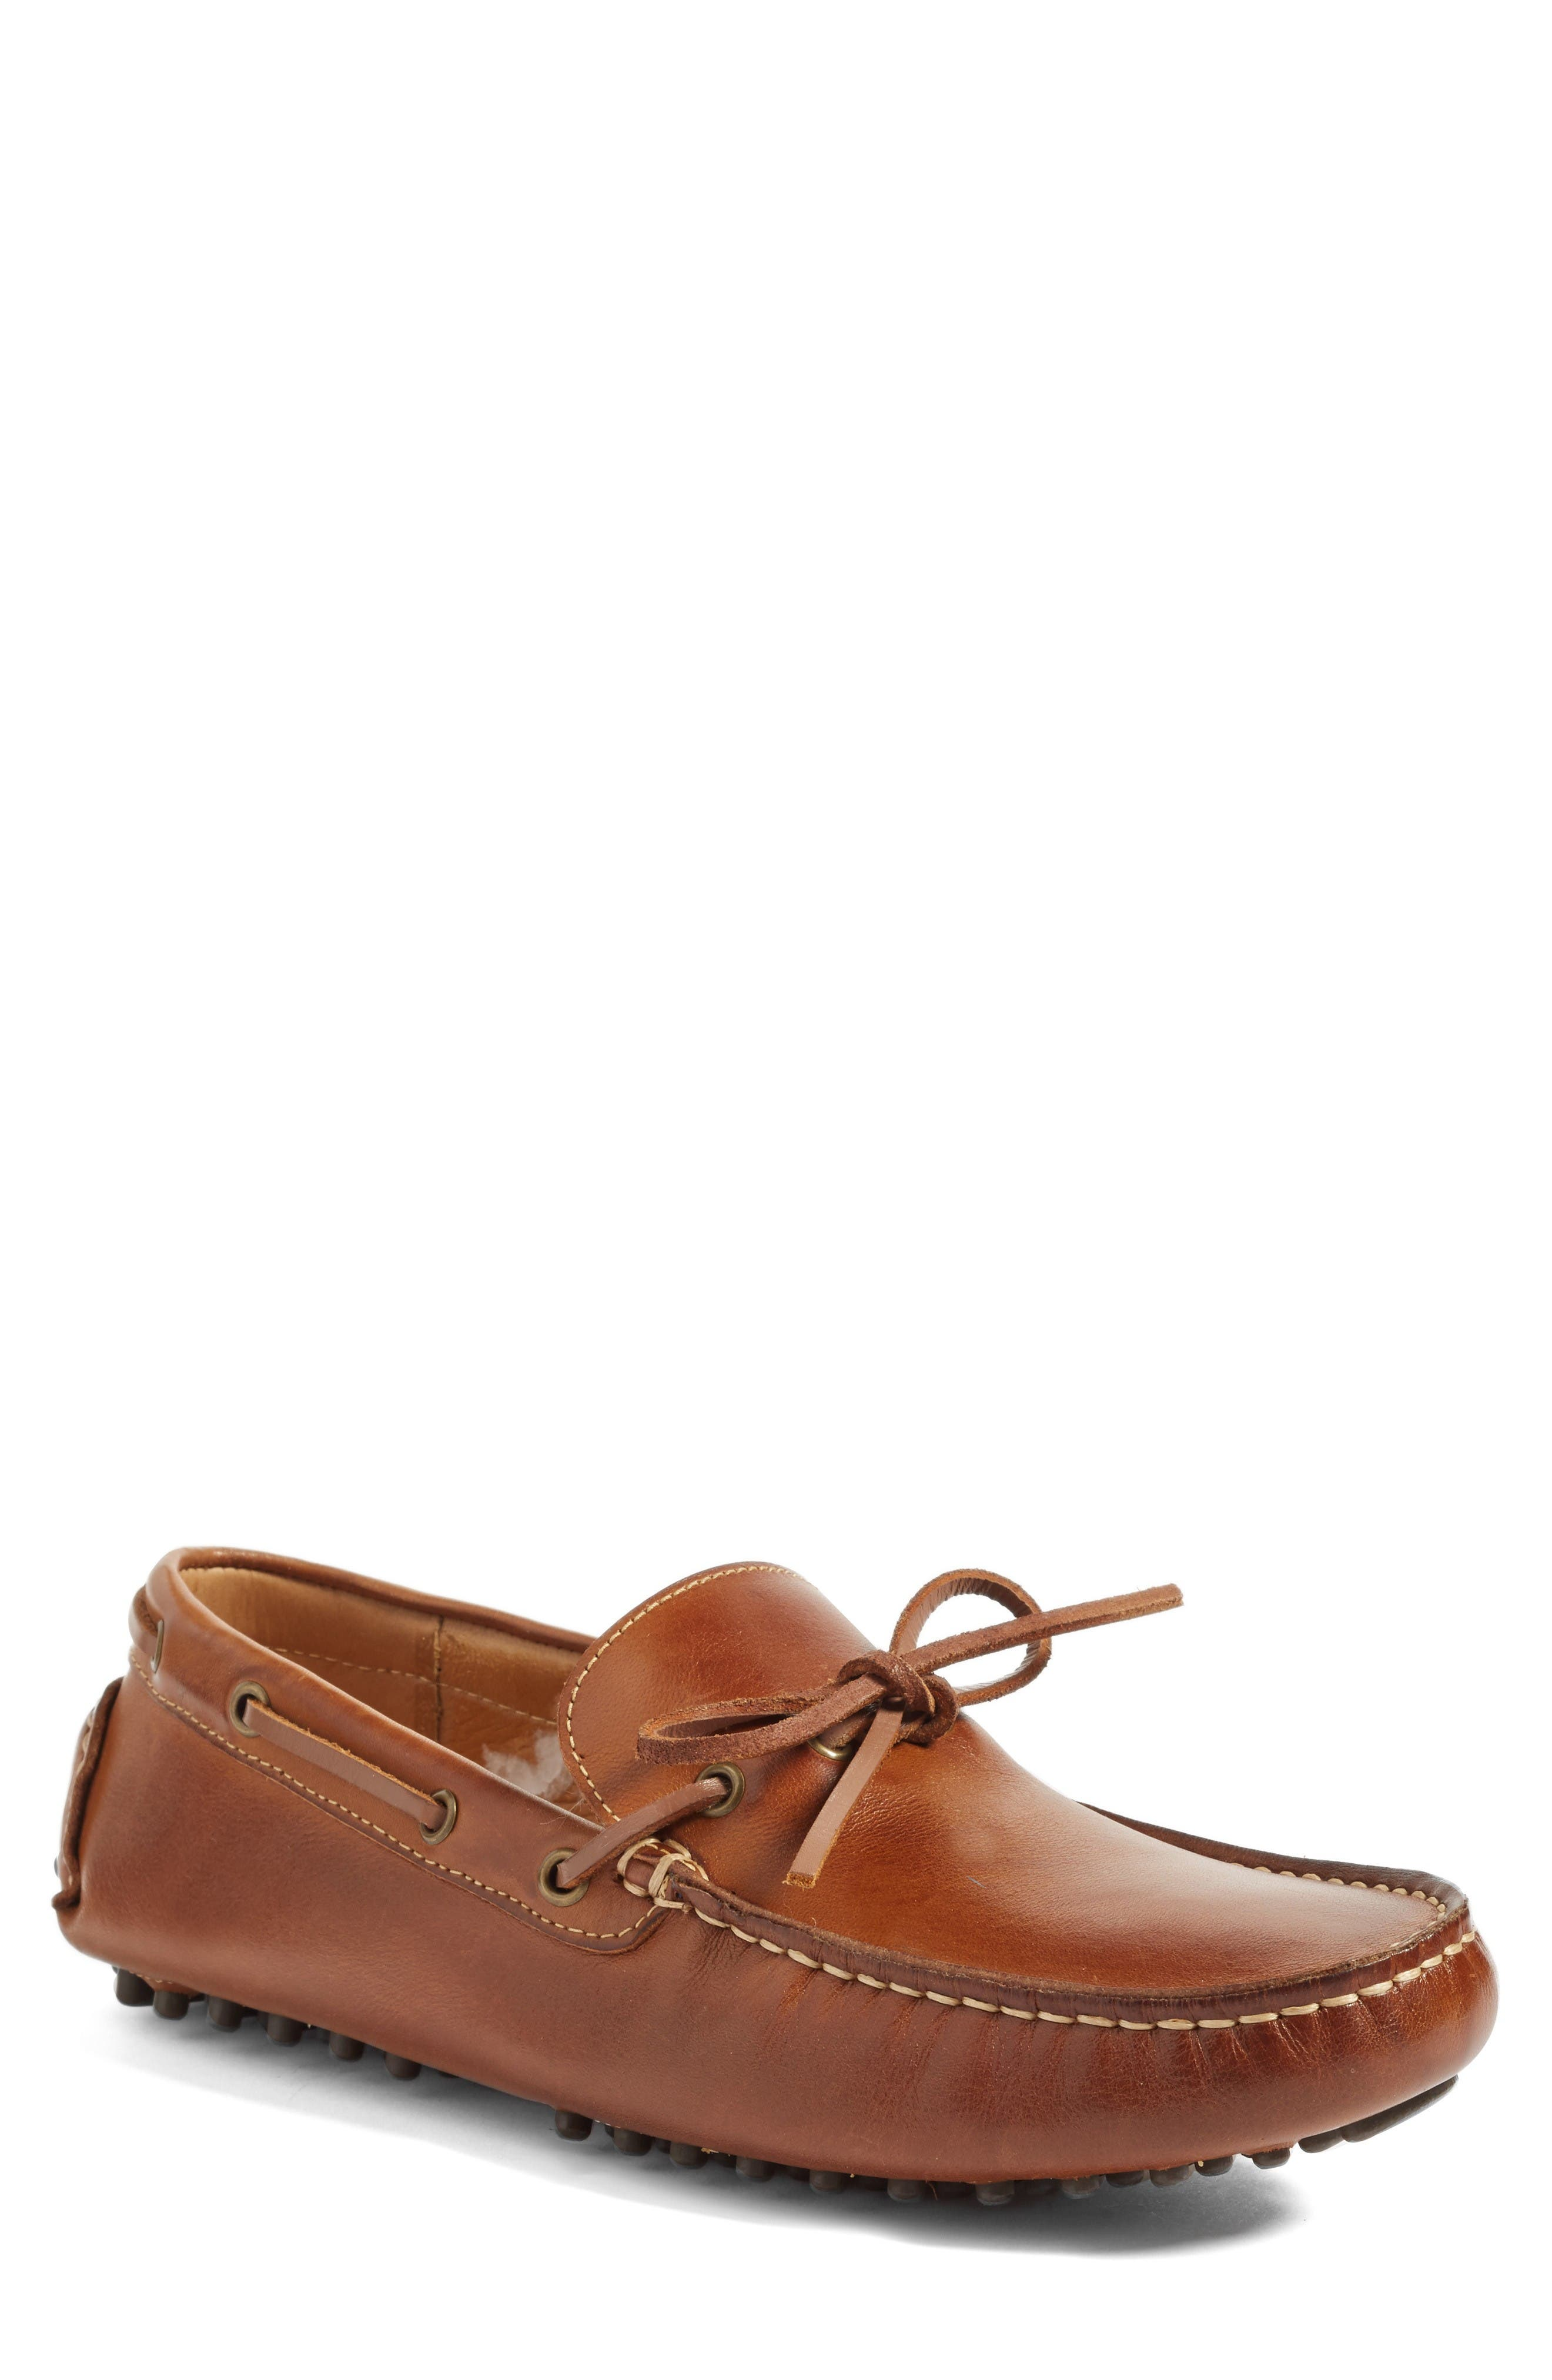 Main Image - John W. Nordstrom® Midland Driving Shoe (Men)